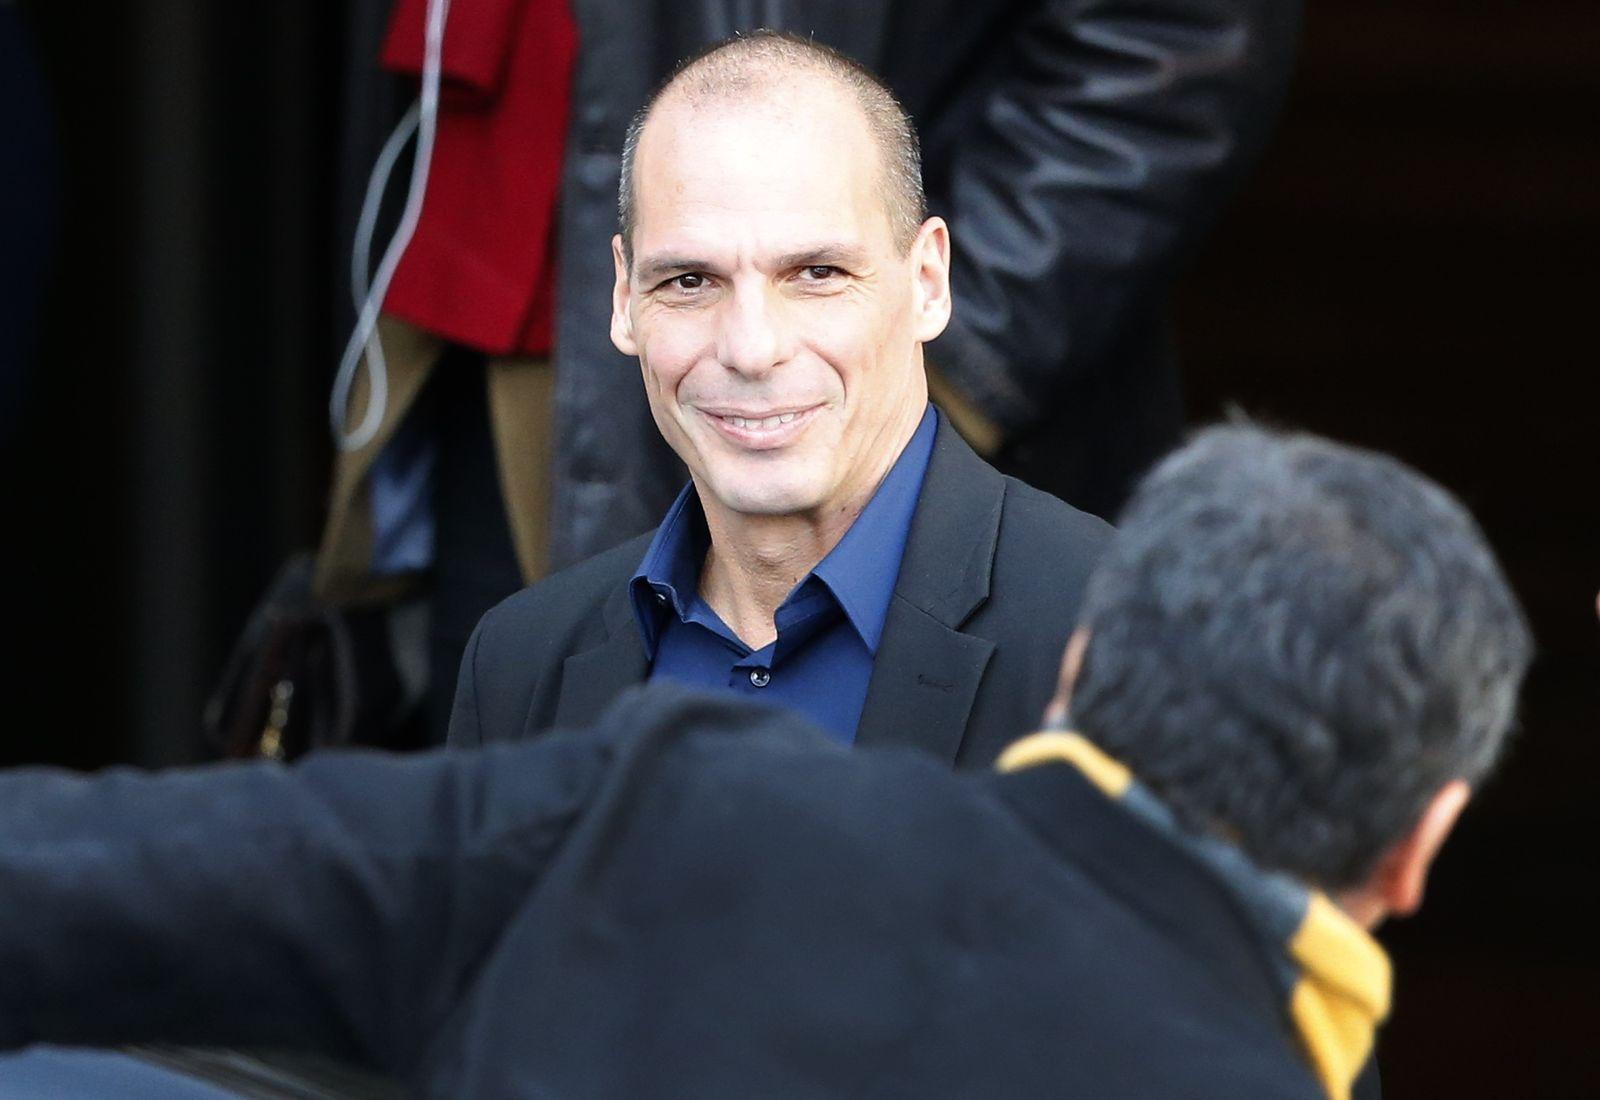 Yanis Varoufakis / Berlin